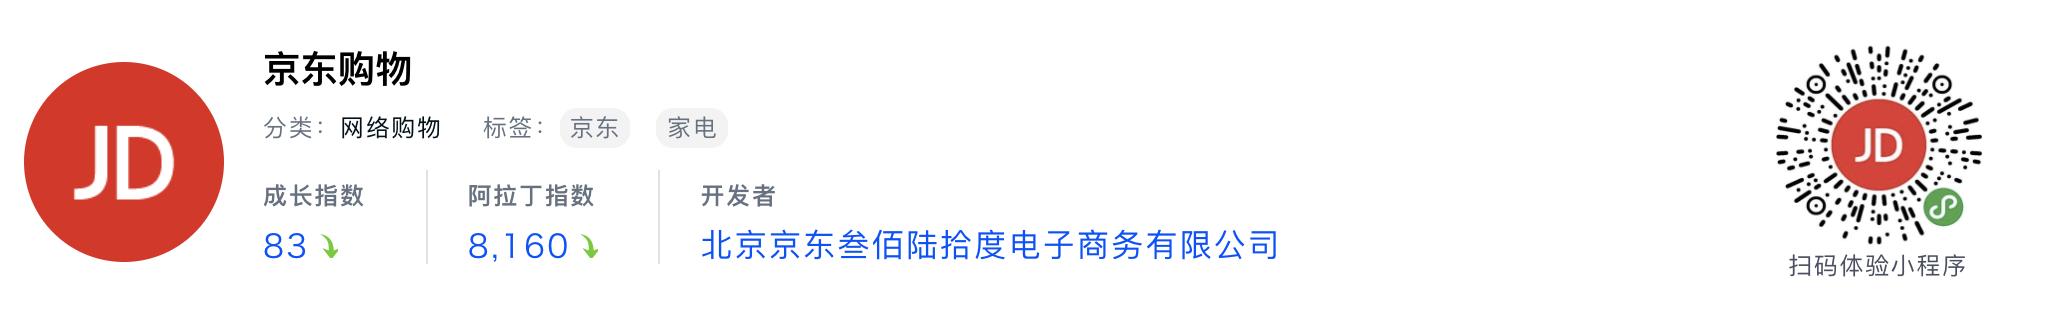 WeChatミニプログラム最新ランキングTOP20【2019年6月版】3位:京东购物